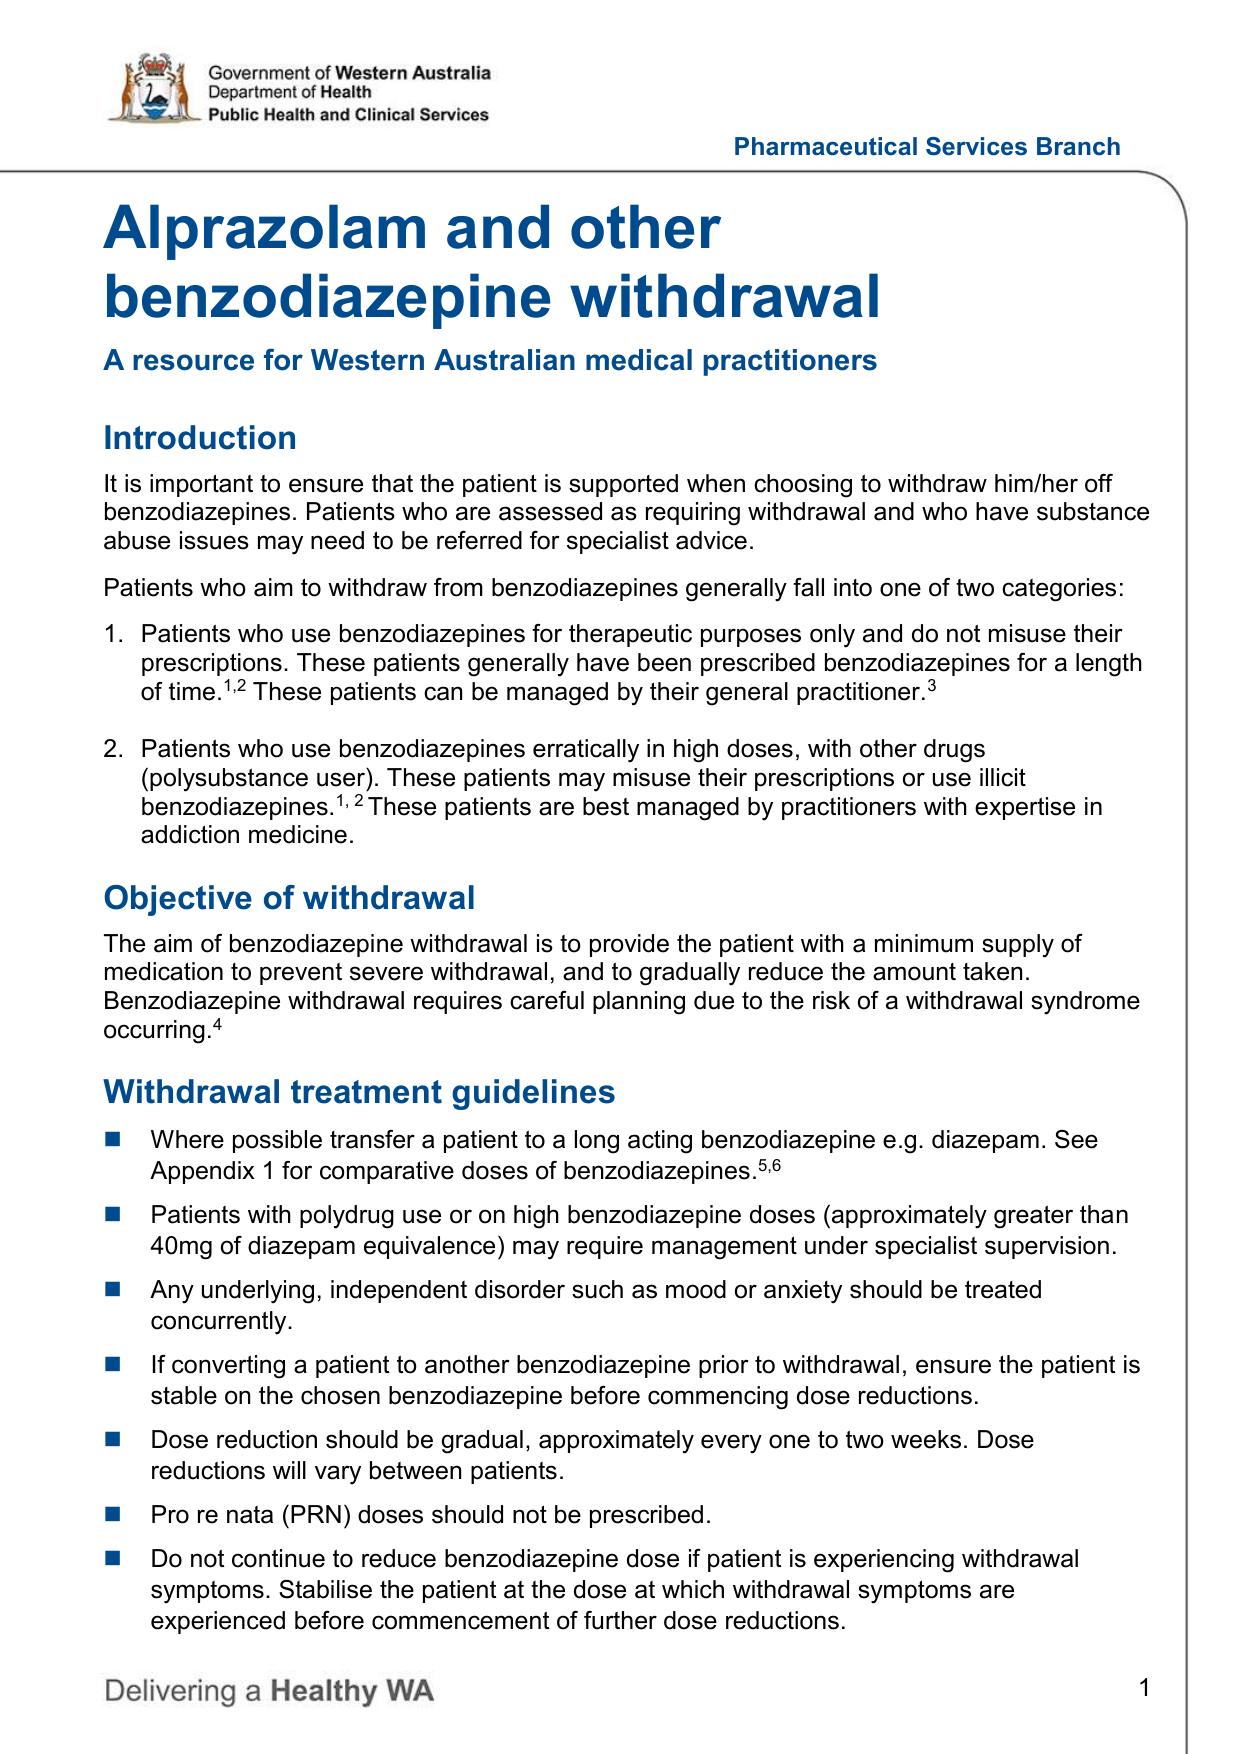 Alprazolam and other benzodiazepine withdrawal